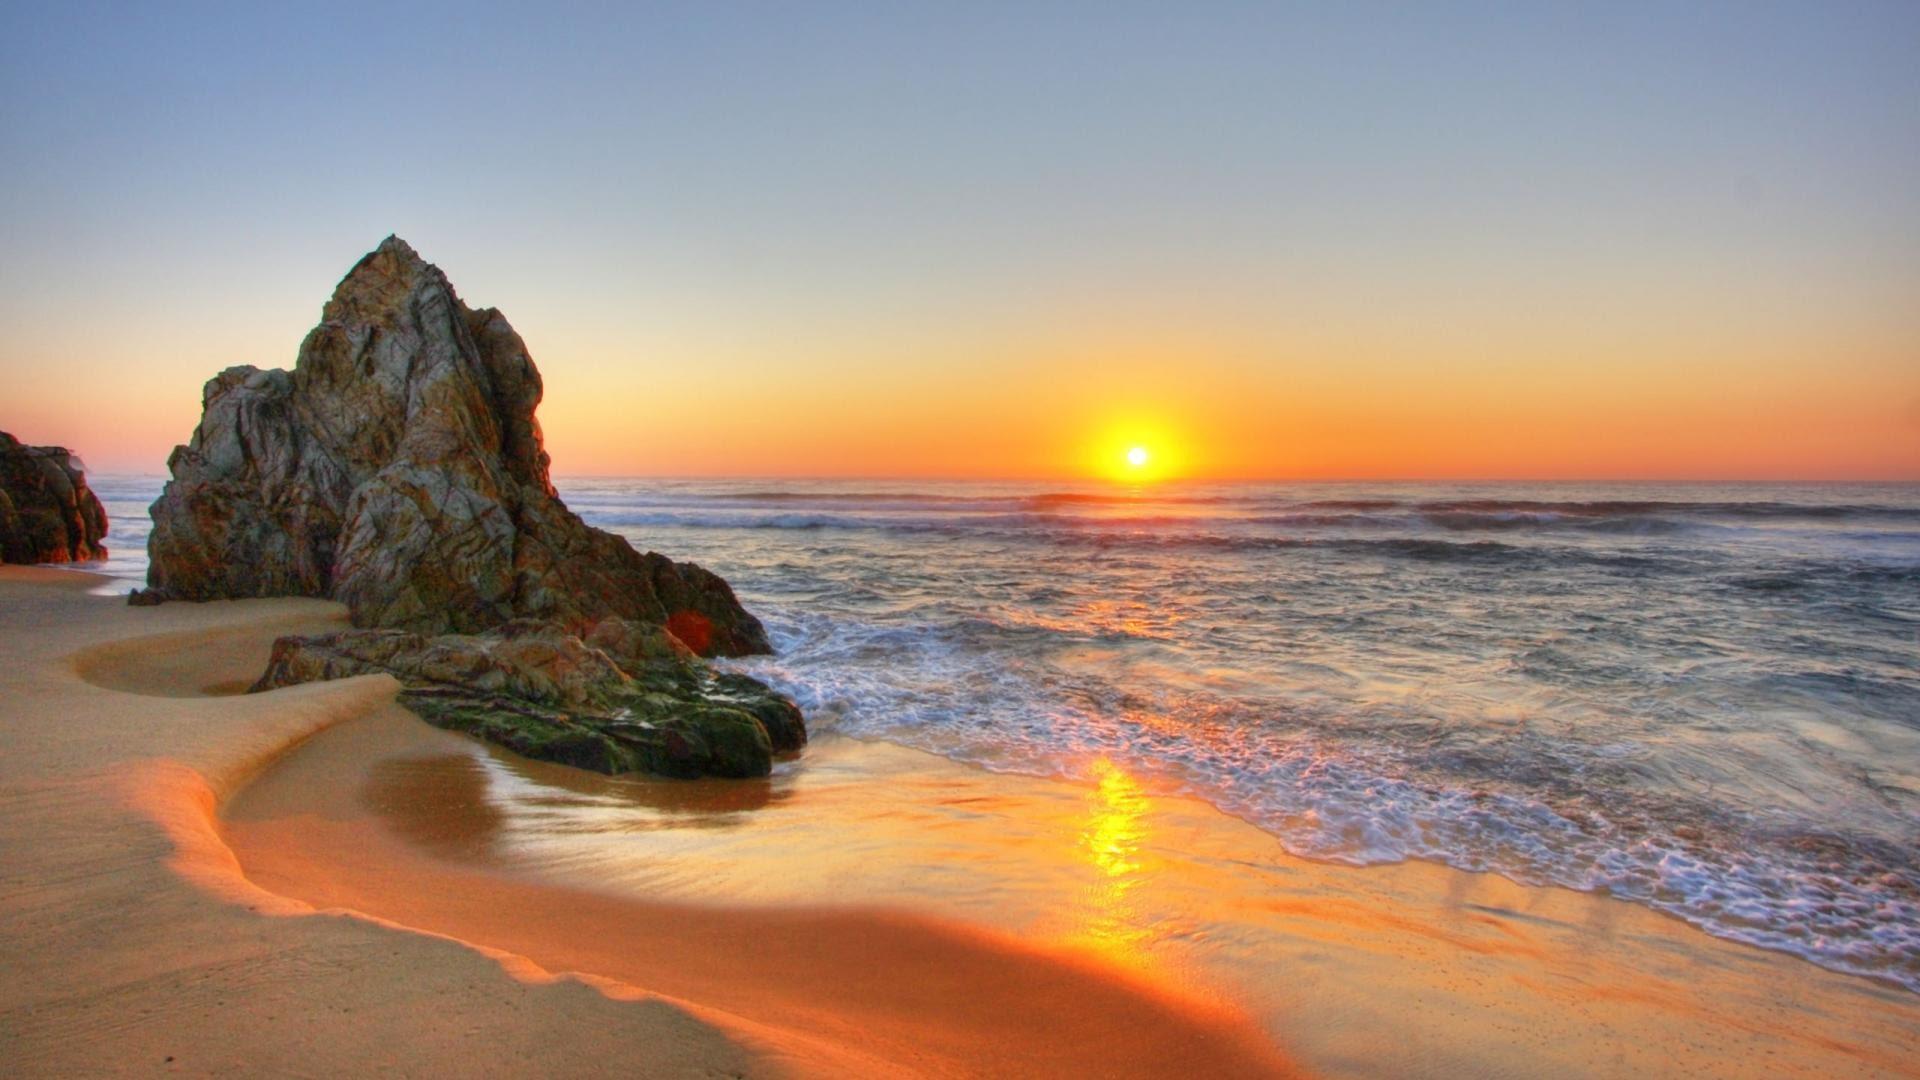 Beach Sunset Hd